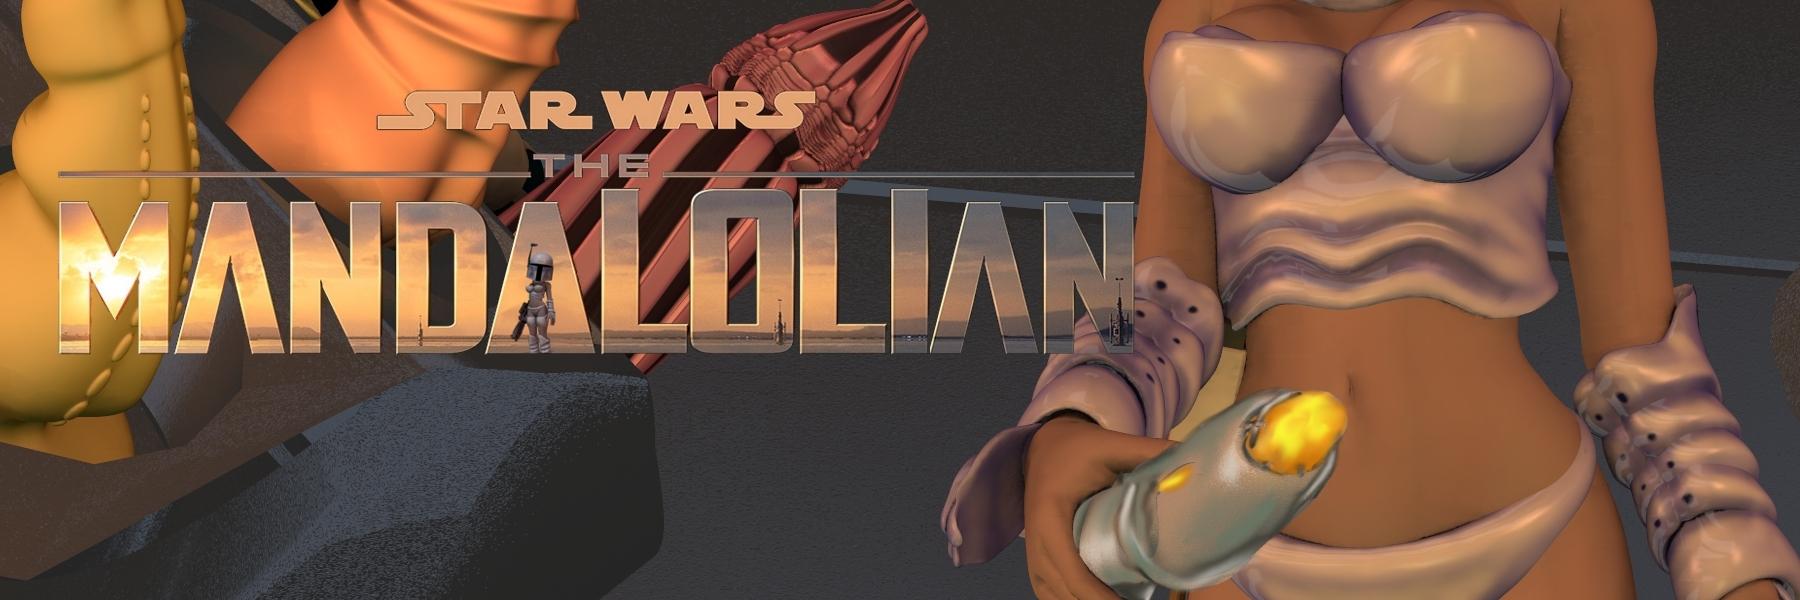 Star Wars the MandaLOLIan Parody Hentai Image 011.